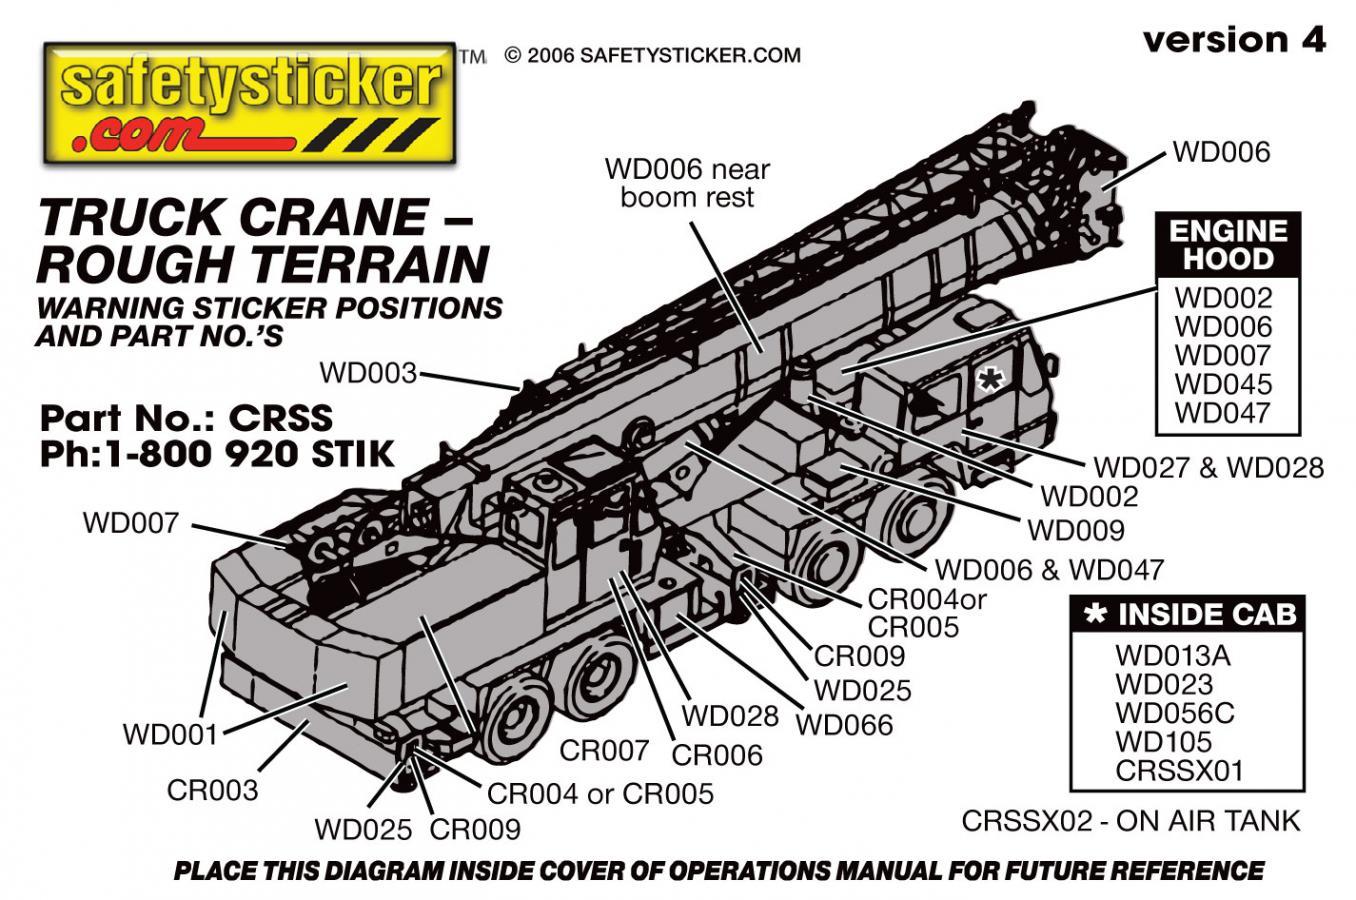 Rough Terrain Crane Application : Rough terrain crane safety sheet sticker